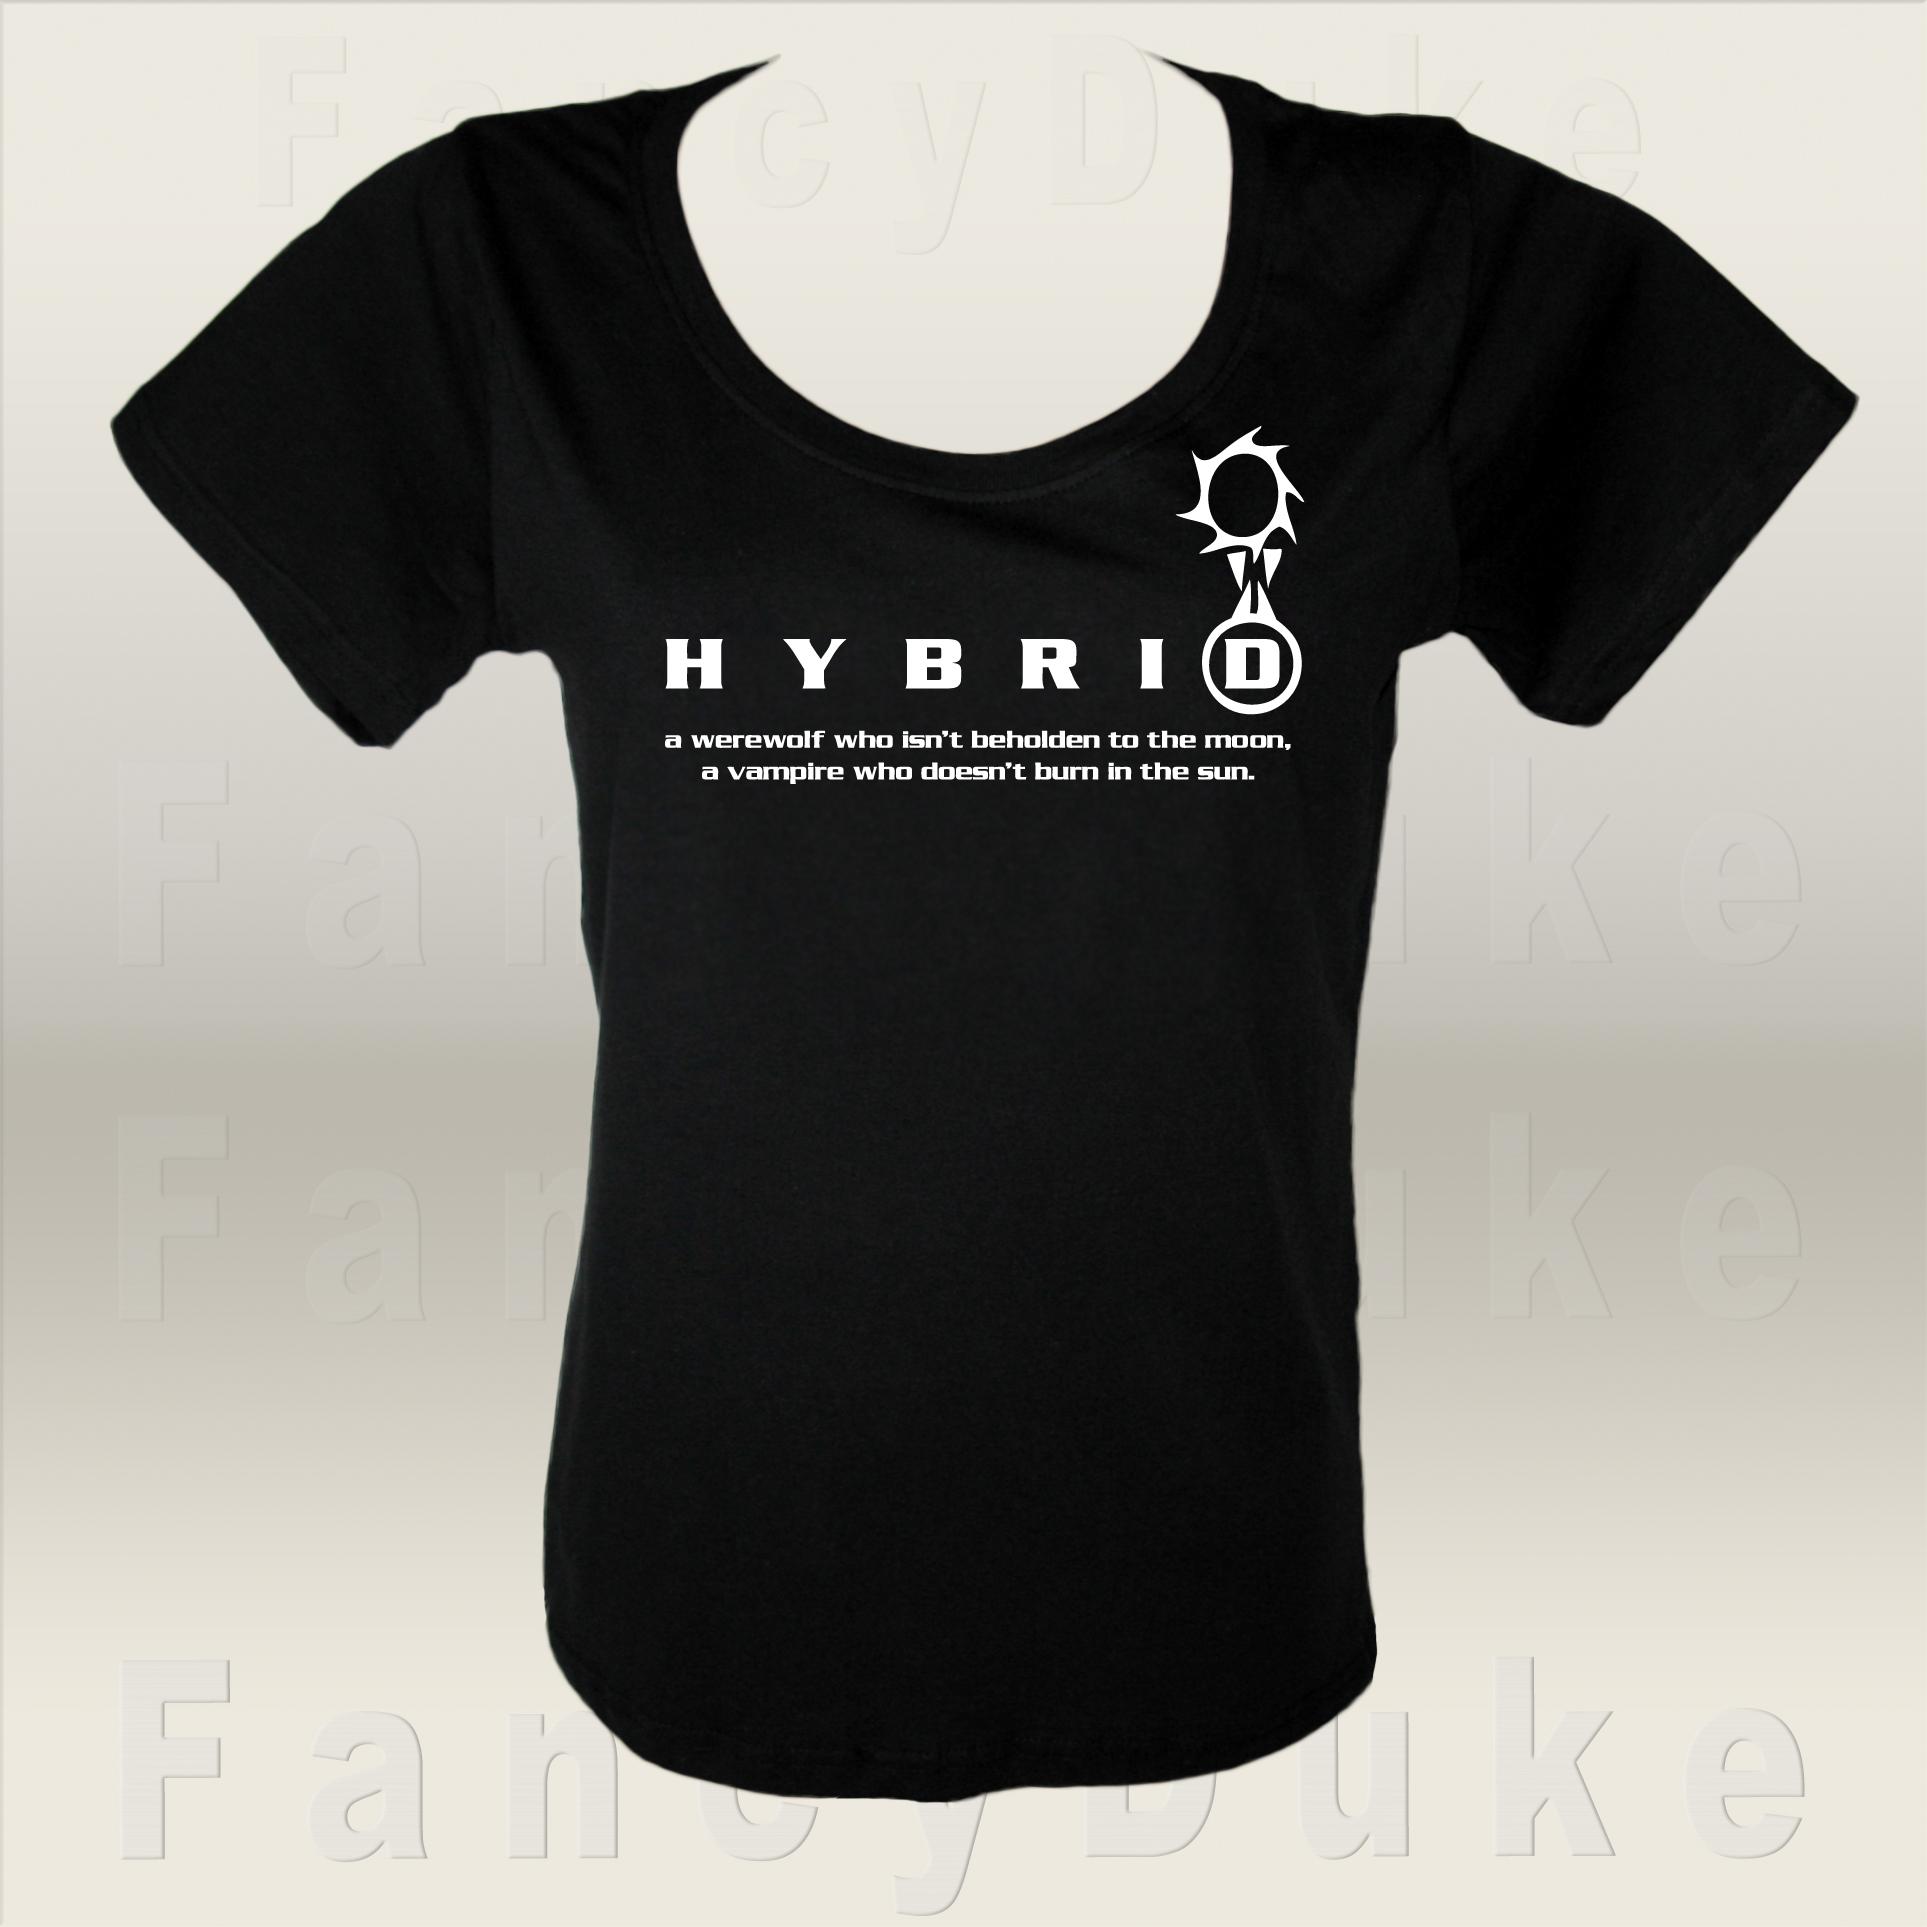 Hybrid T-Shirt Design by Svetlana